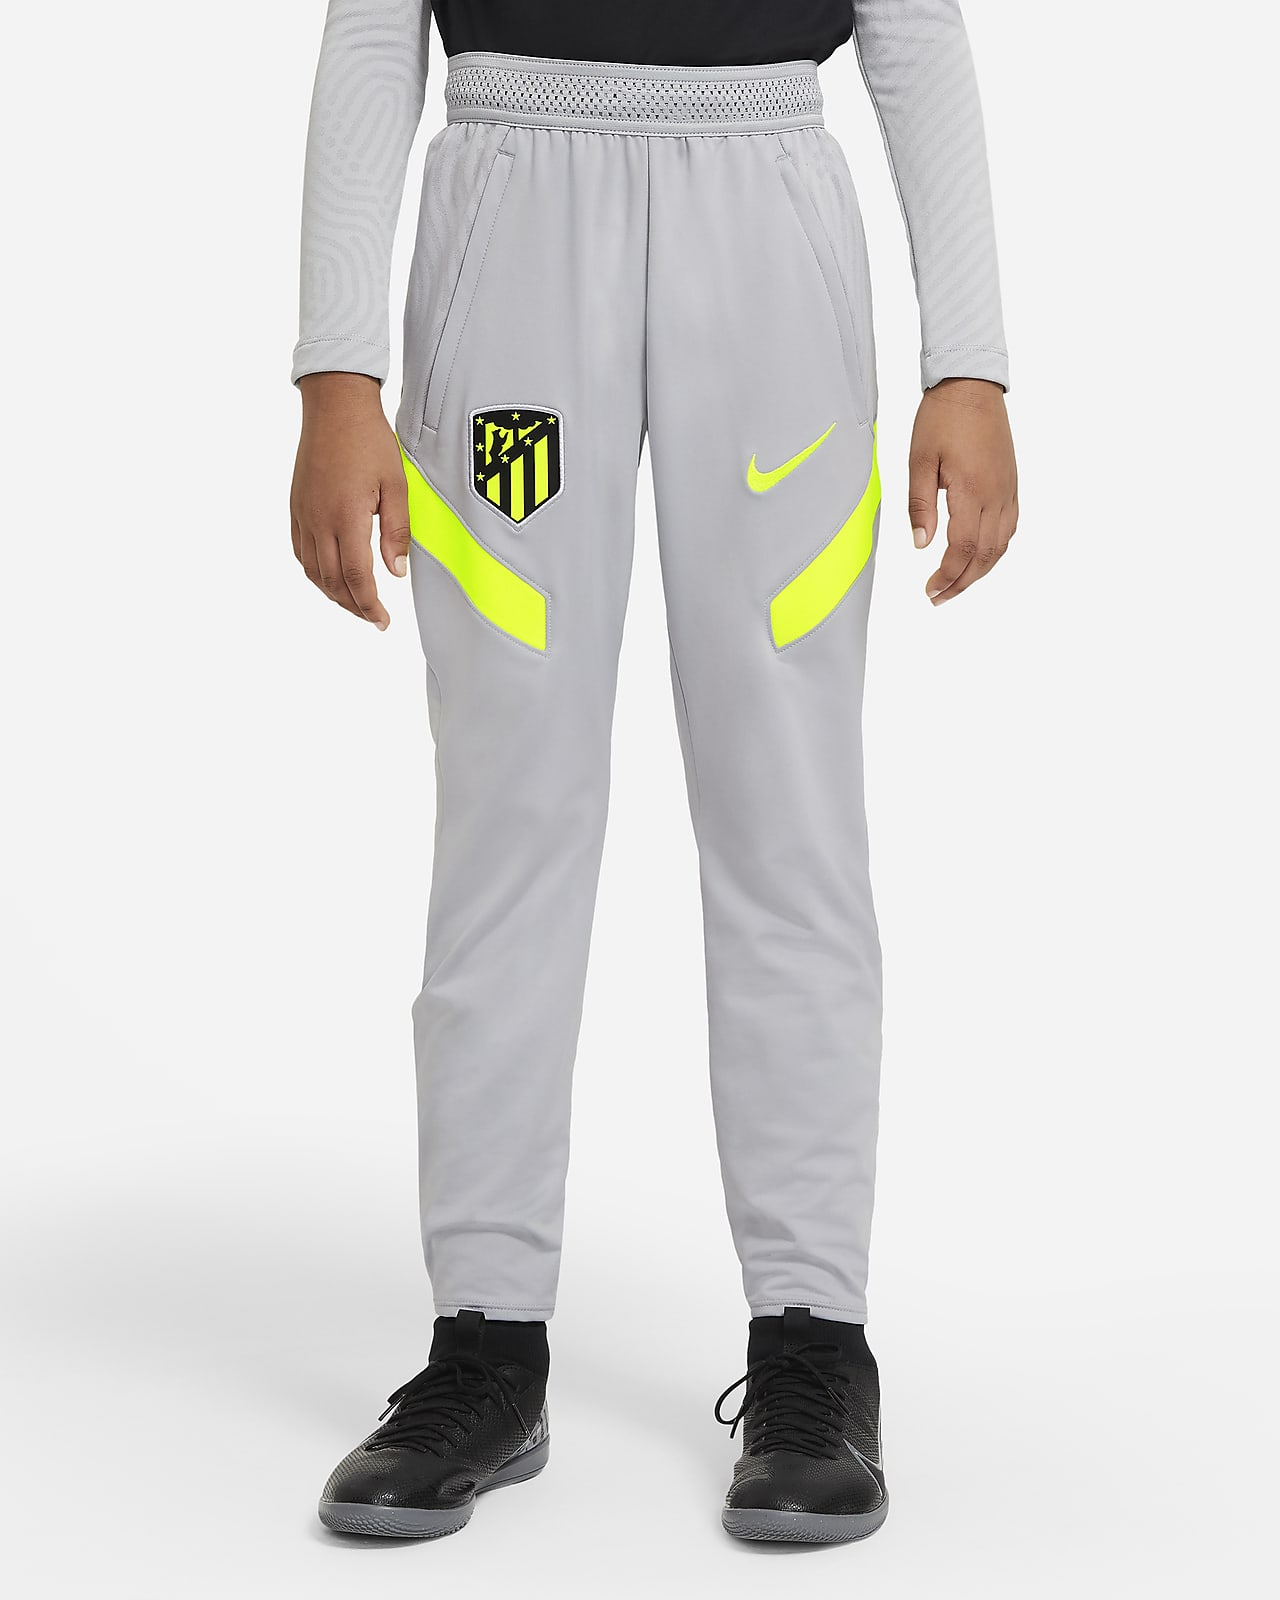 taller Rico aluminio  Atlético de Madrid Strike Pantalón de fútbol - Niño/a. Nike ES